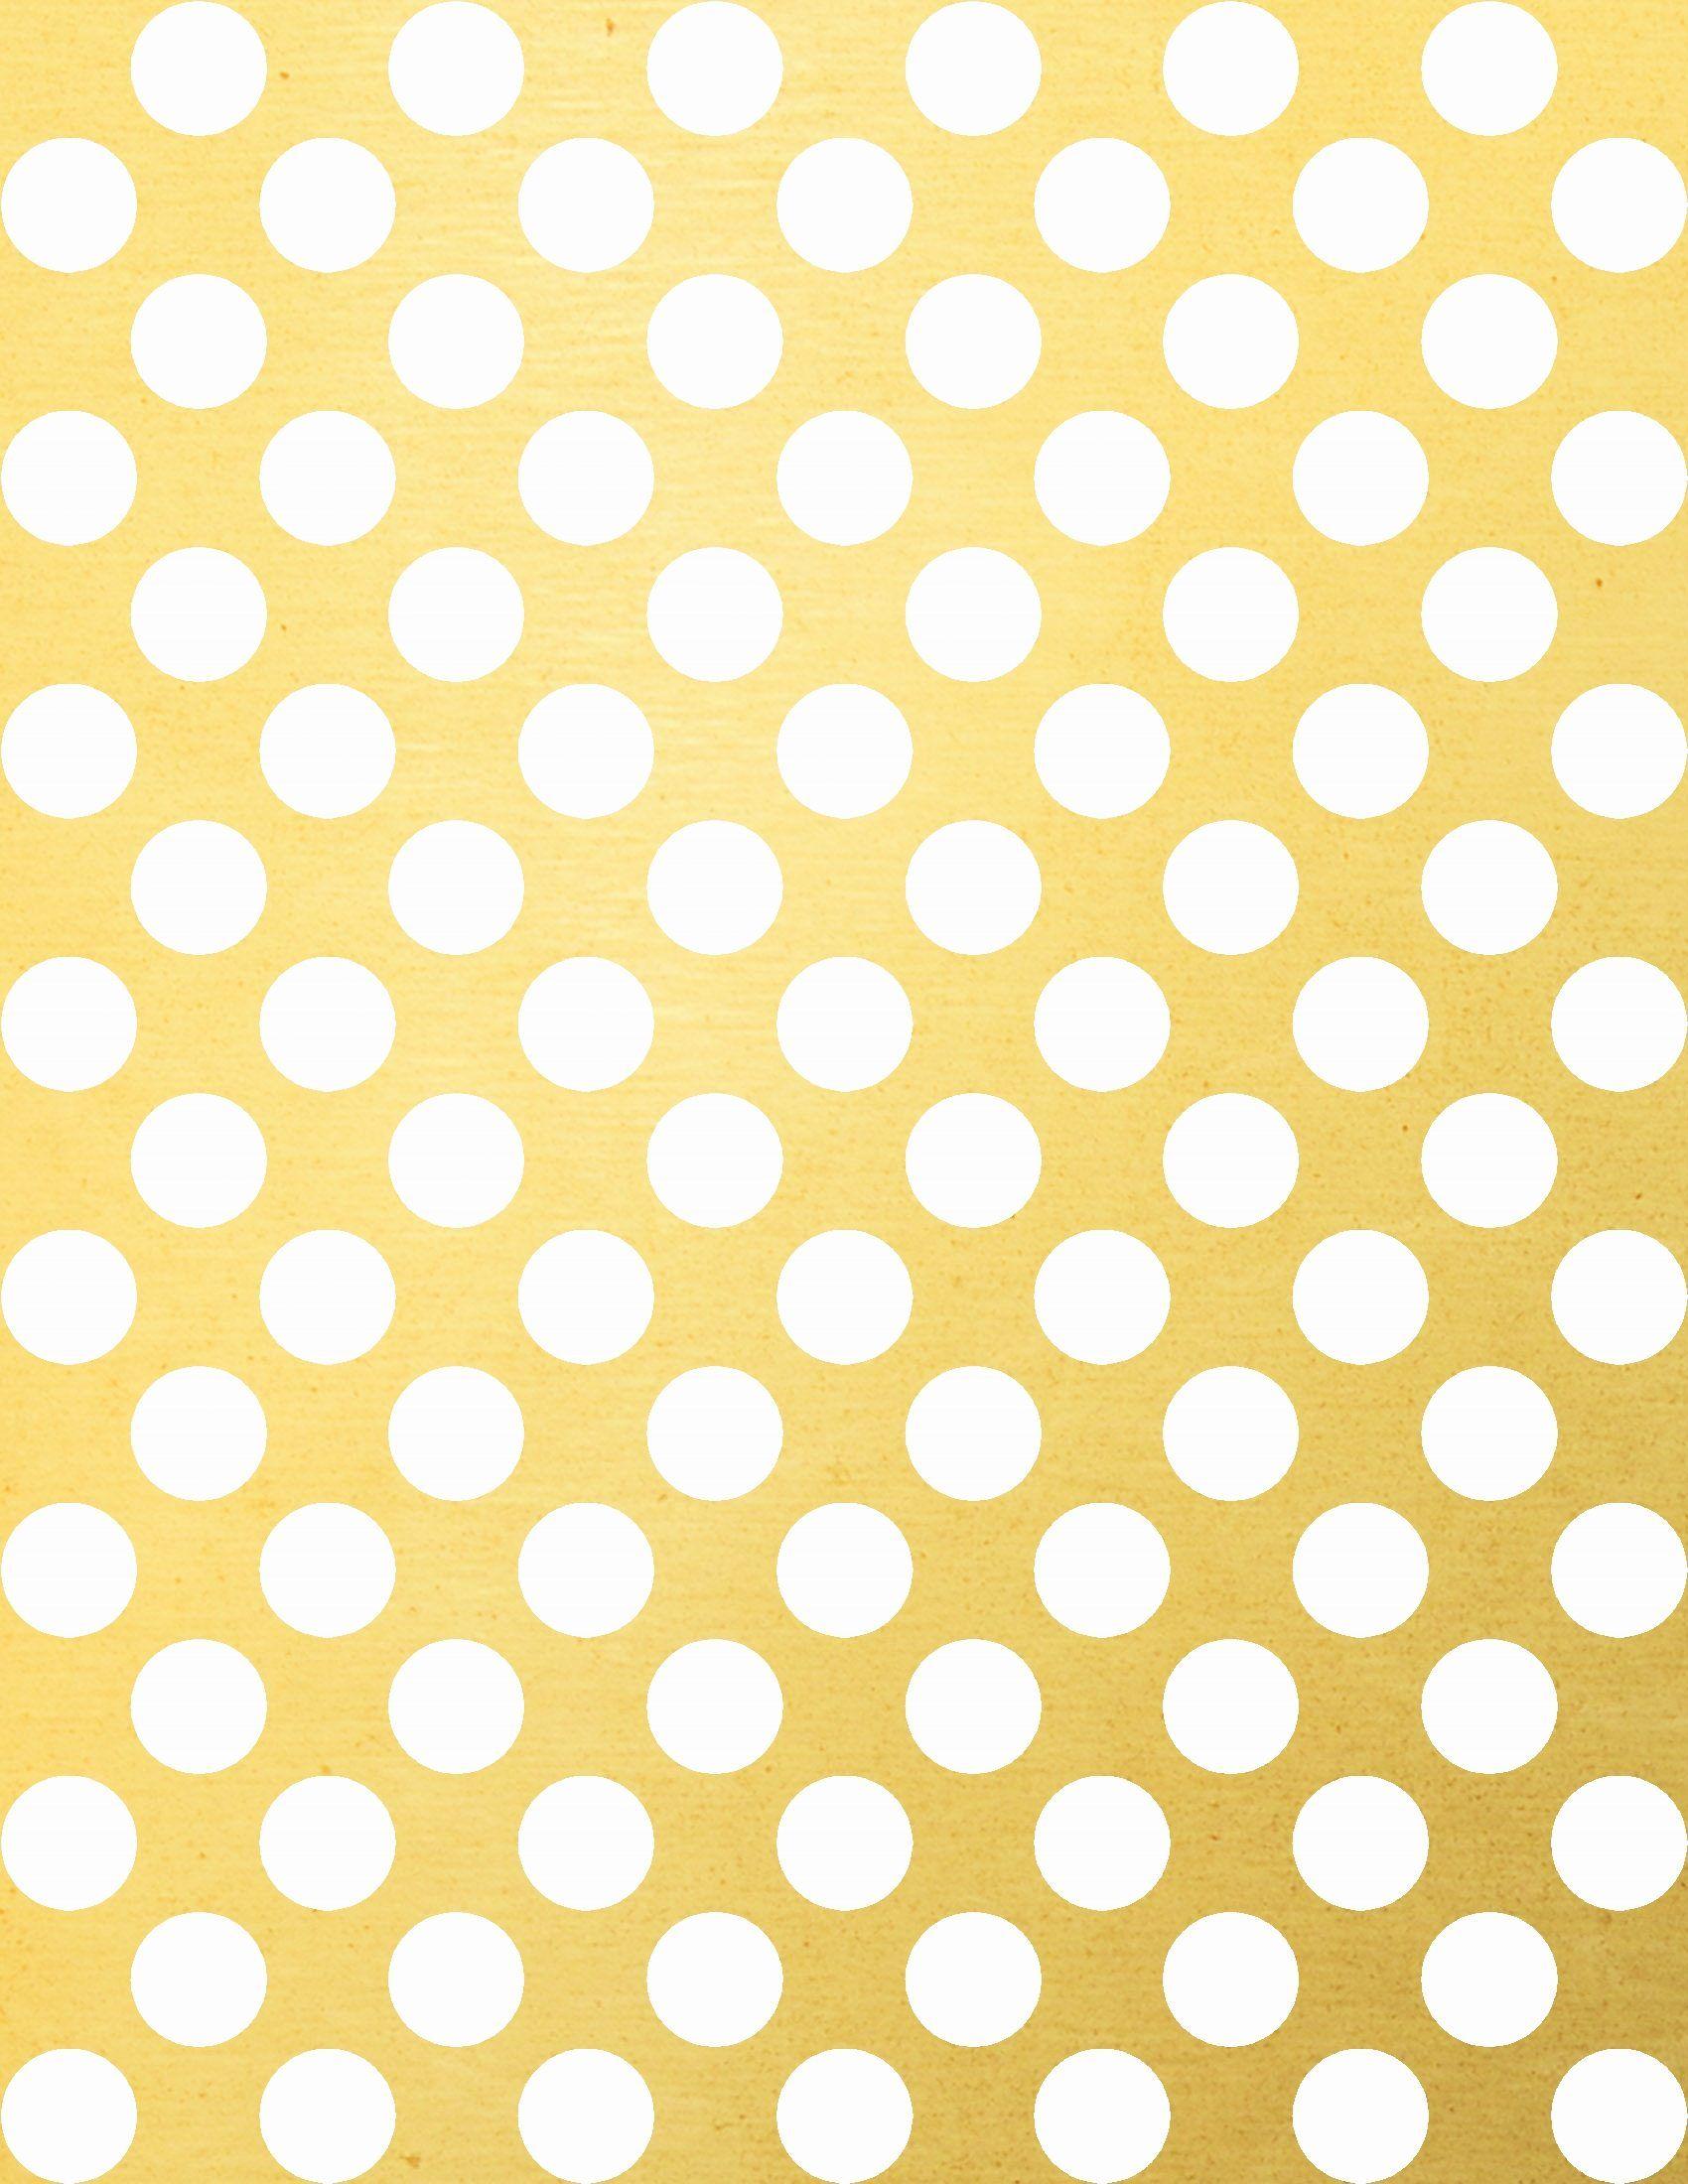 goldpolkadotbackground1.jpg (1700×2200) Polka dot